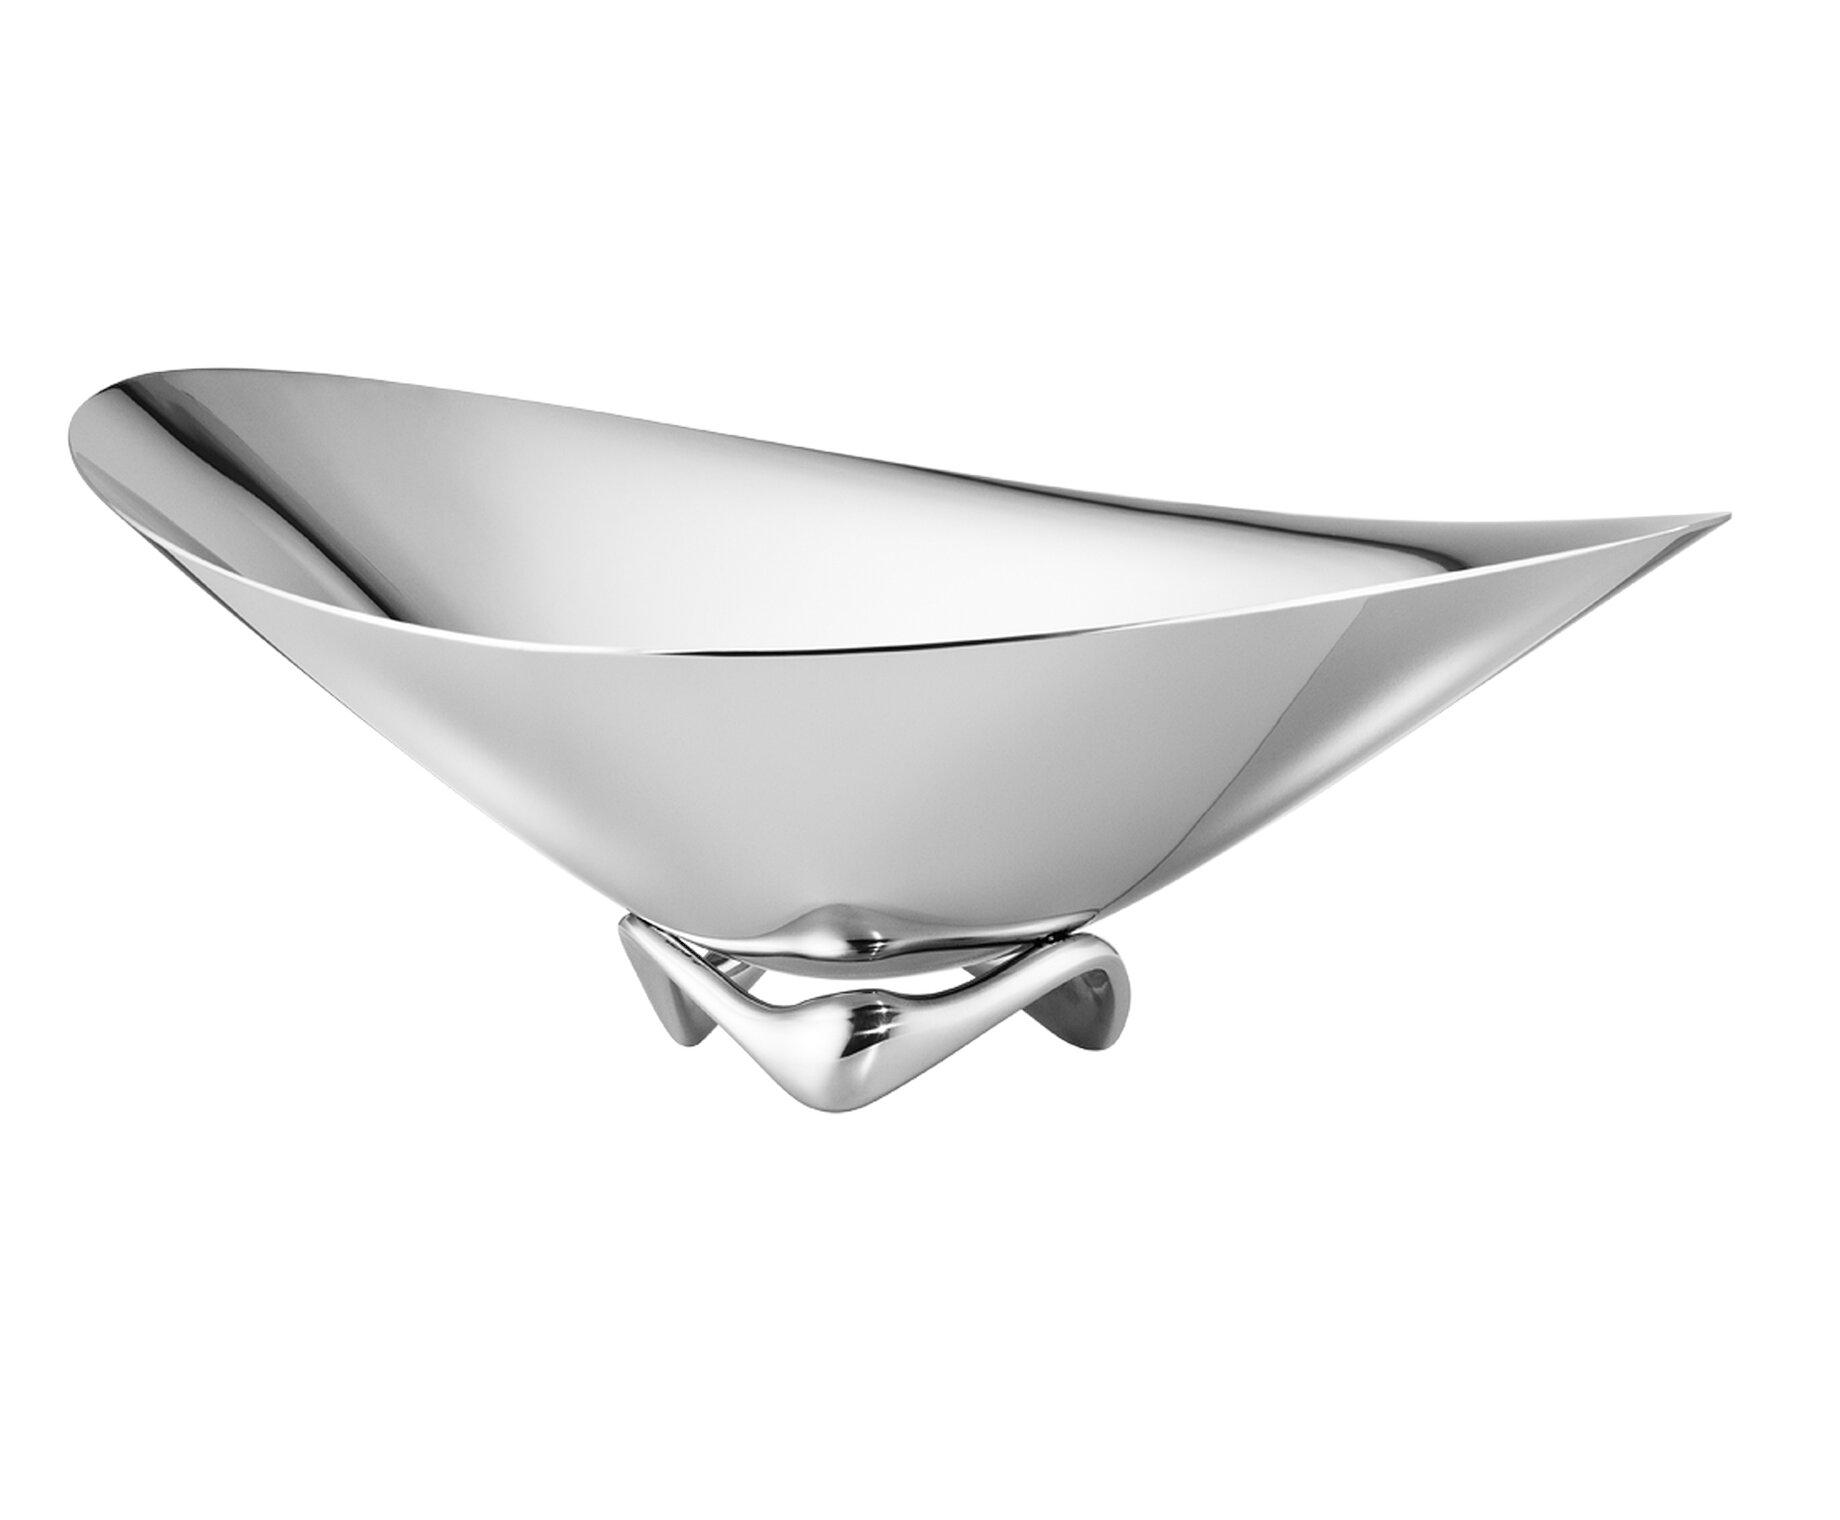 Metal Decorative Plates Bowls You Ll Love In 2021 Wayfair